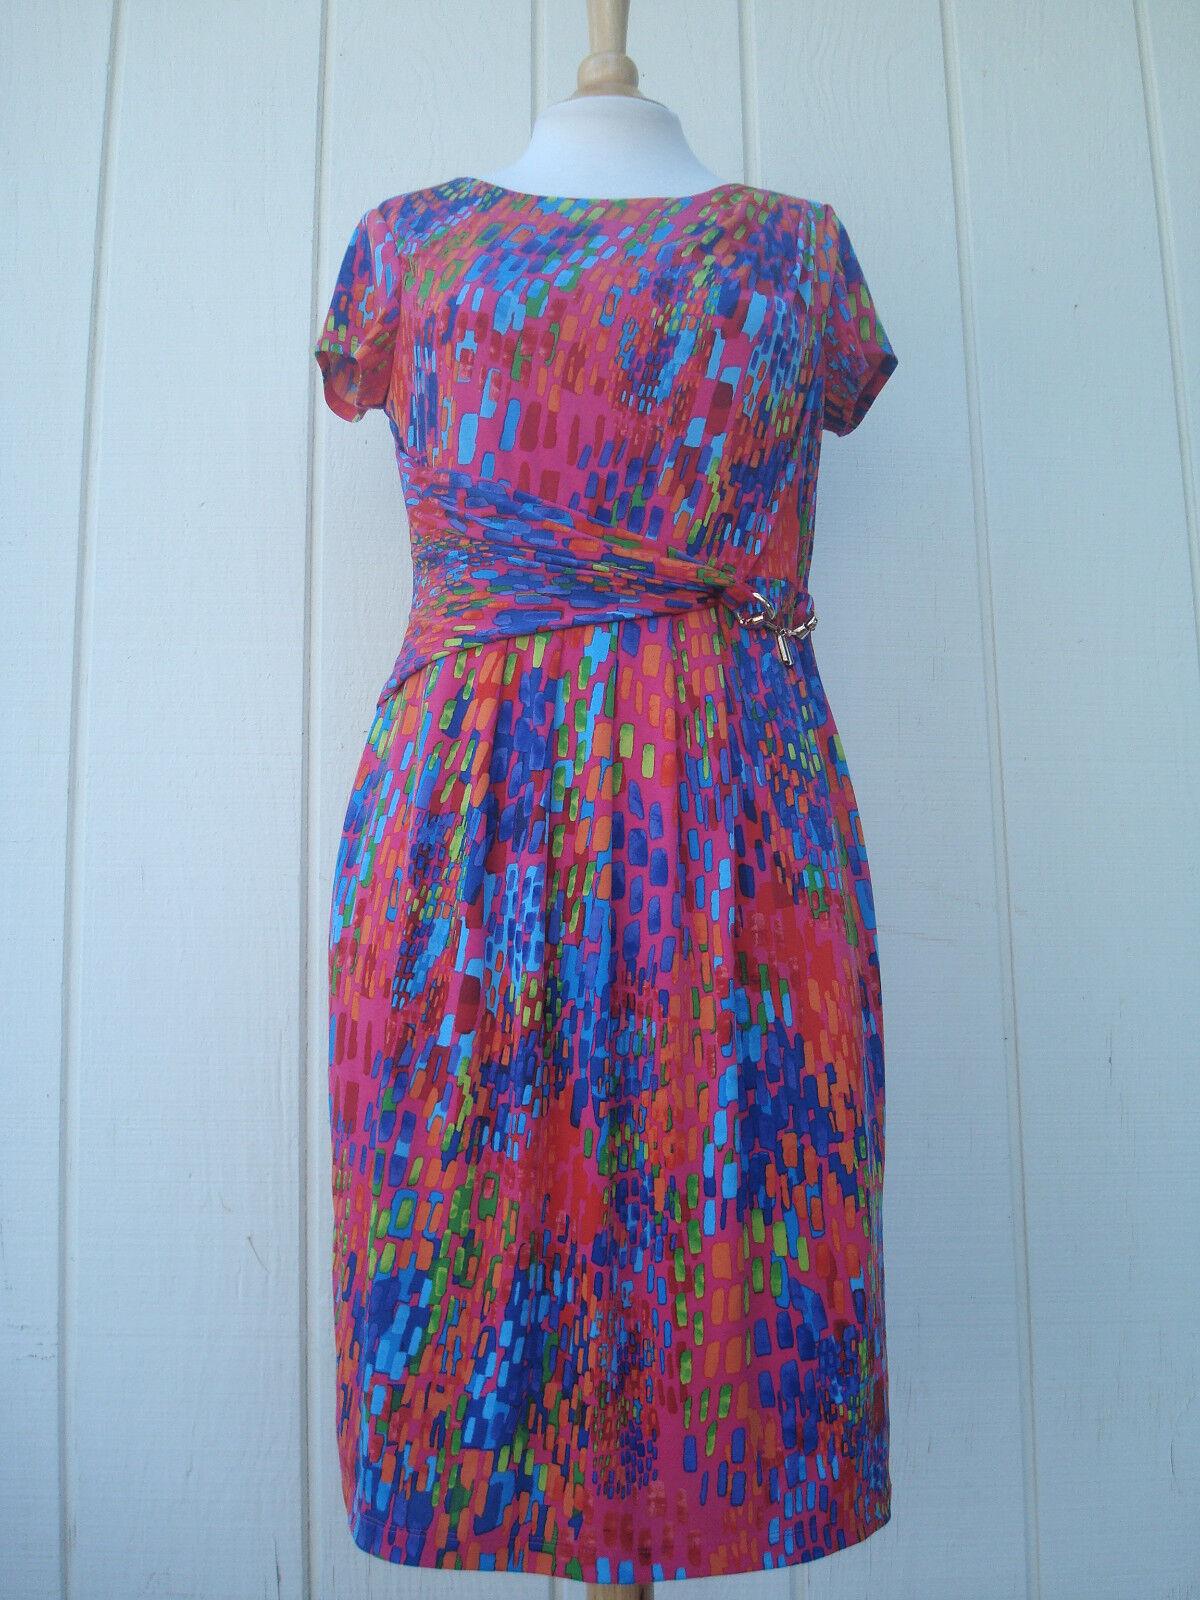 ba06a588db New Ellen Tracy Multi-color Cap Sleeve gold Women s Dress Sz 8 nrndhc2672- Dresses